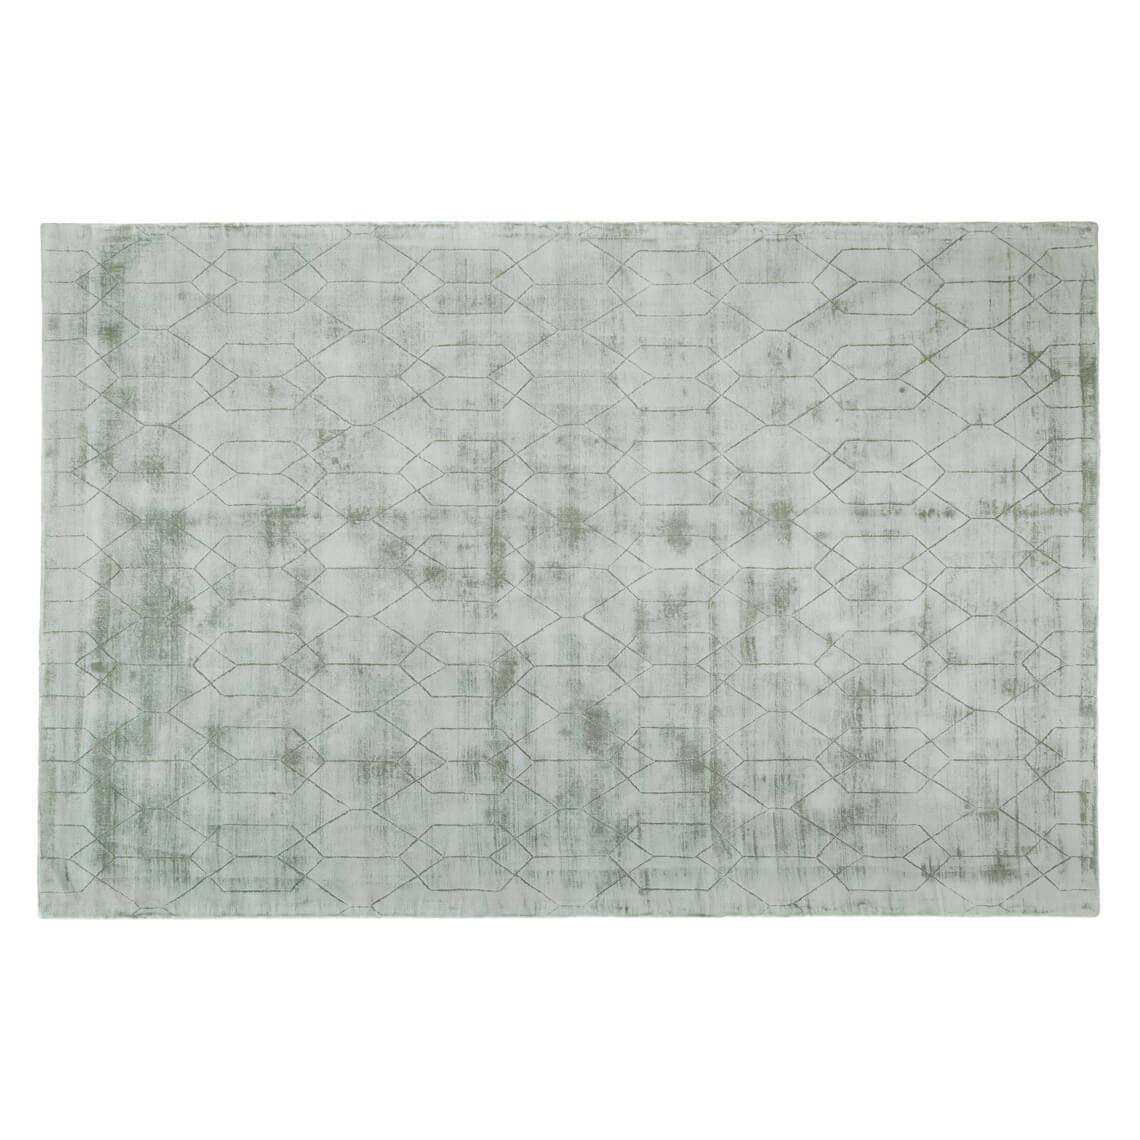 Aiko Floor Rug Size W 200cm x D 300cm x H 1cm in Moss Freedom